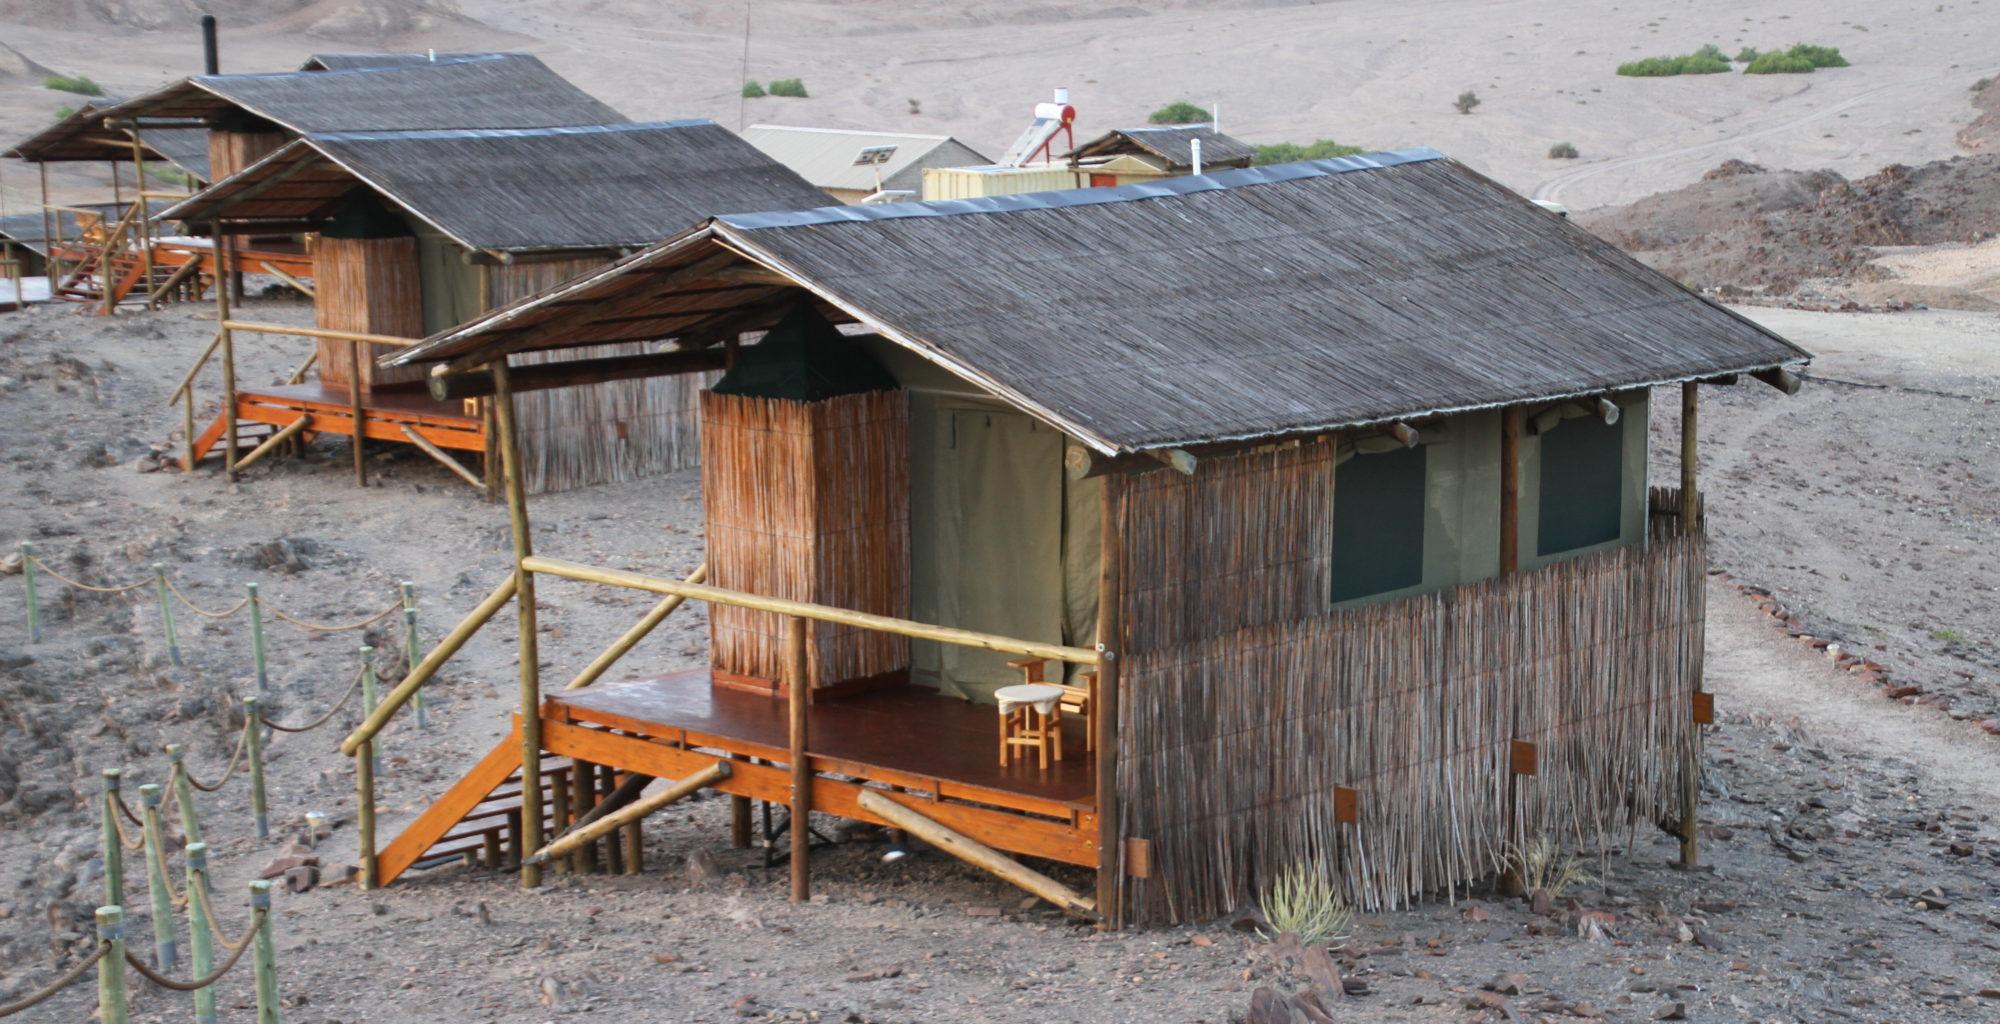 Namibia-Leylandsdrift-Camp-Exterior